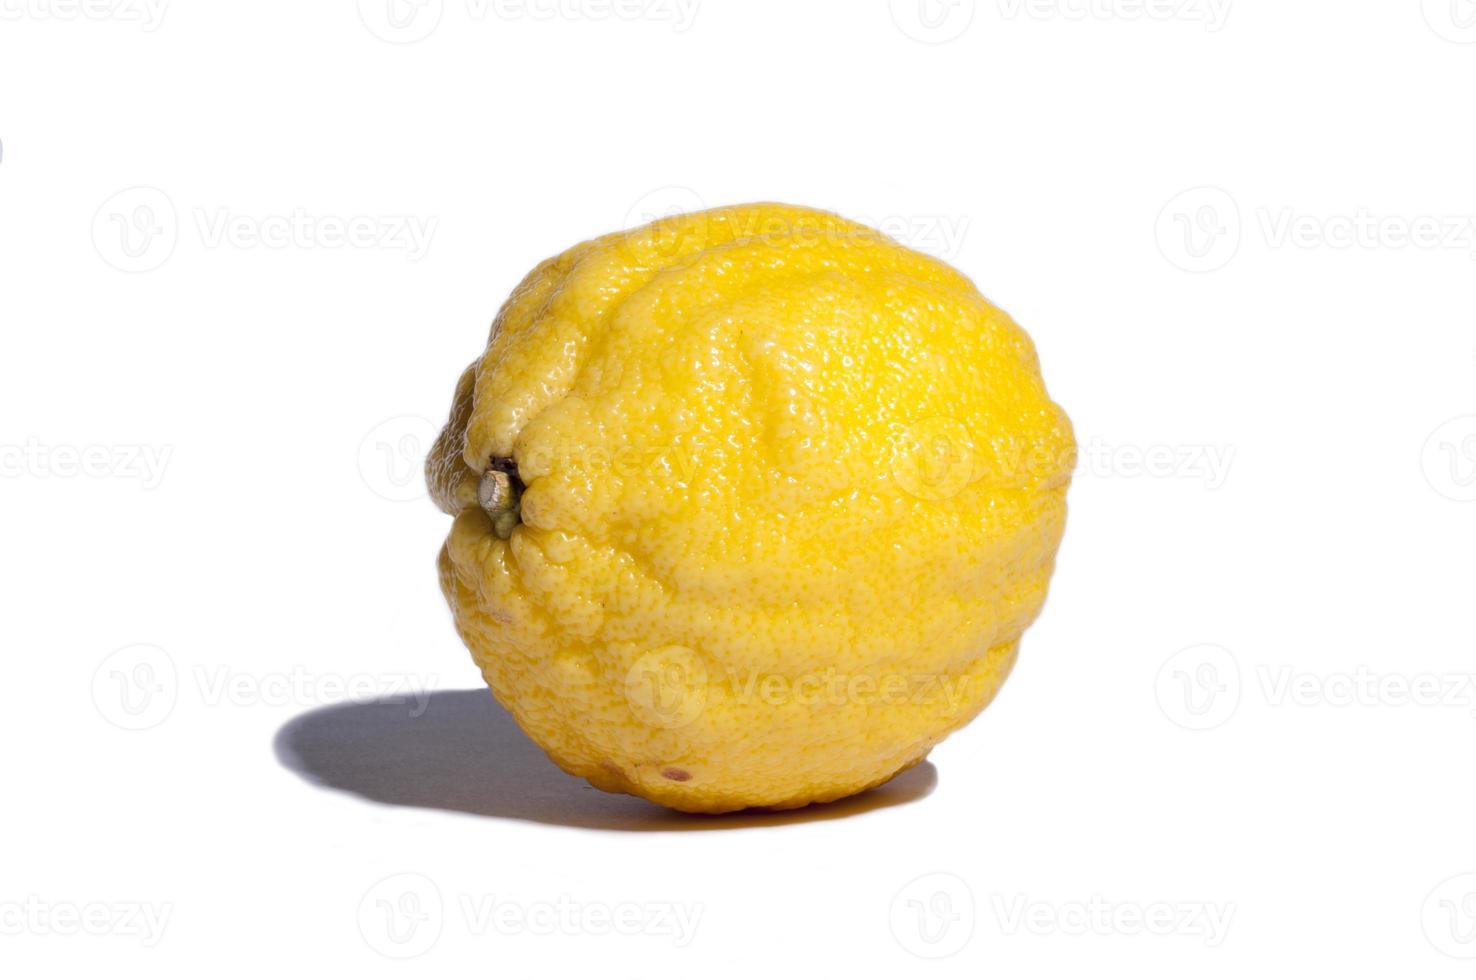 citron isolerad på vit bakgrund foto